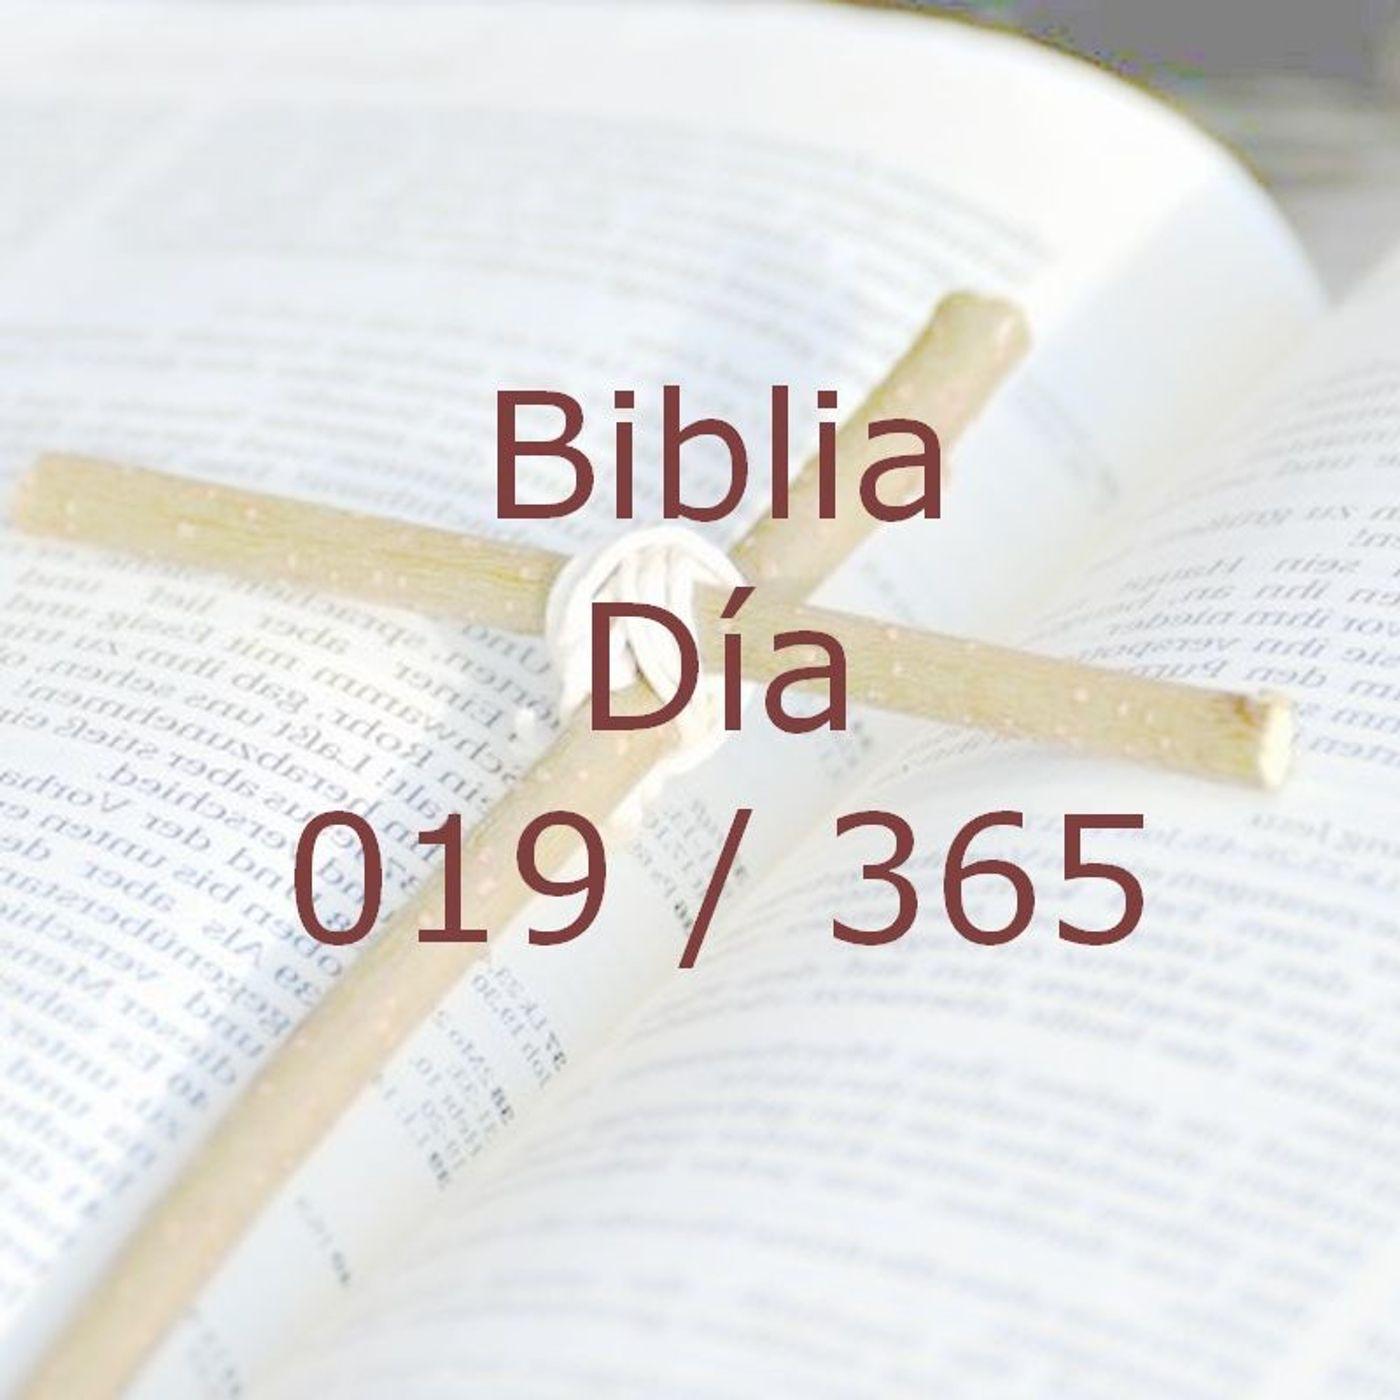 365 dias para la Biblia - Dia 019